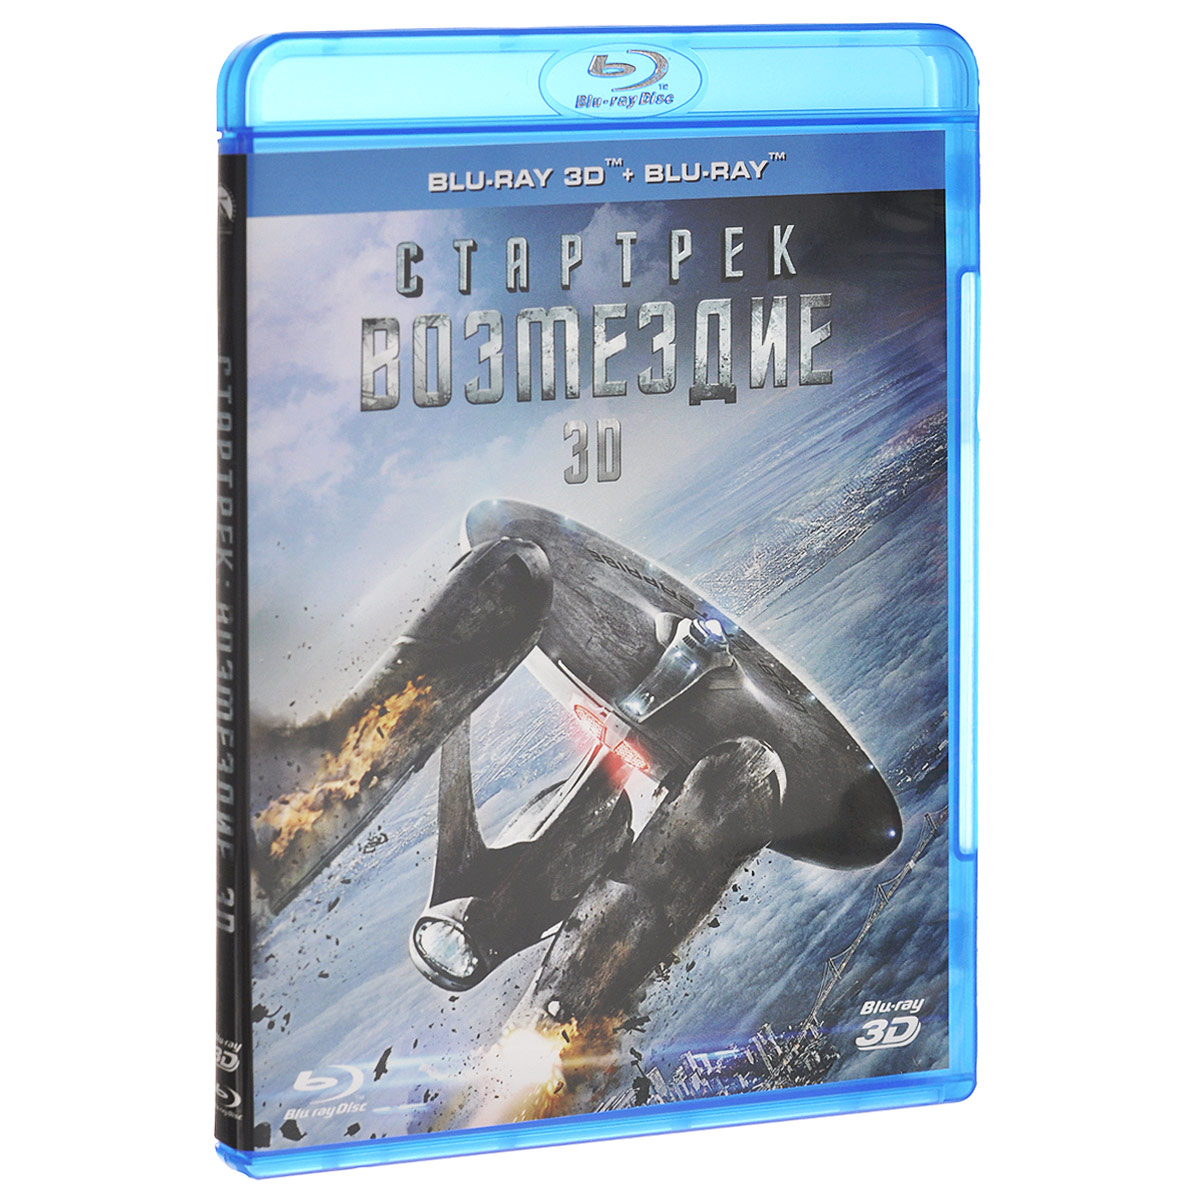 Стартрек: Возмездие 3D и 2D (2 Blu-ray)